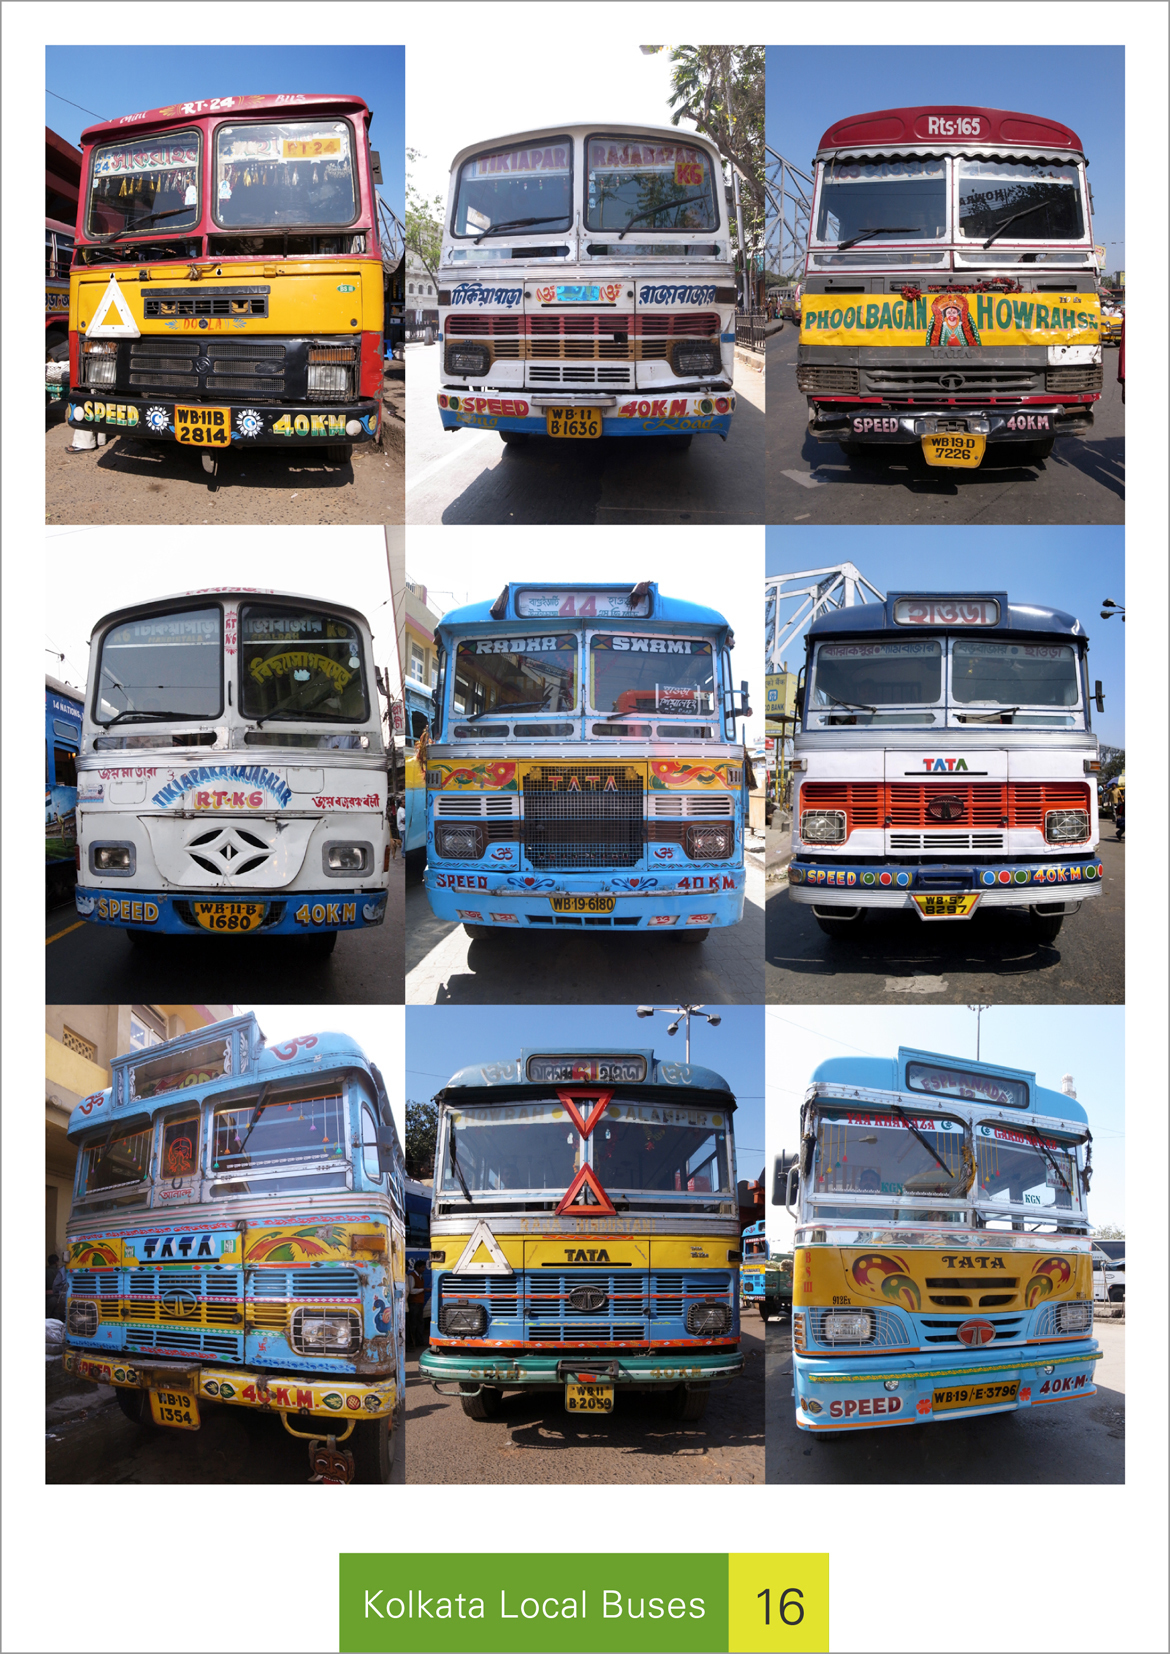 KolkataLocalBus-16.jpg